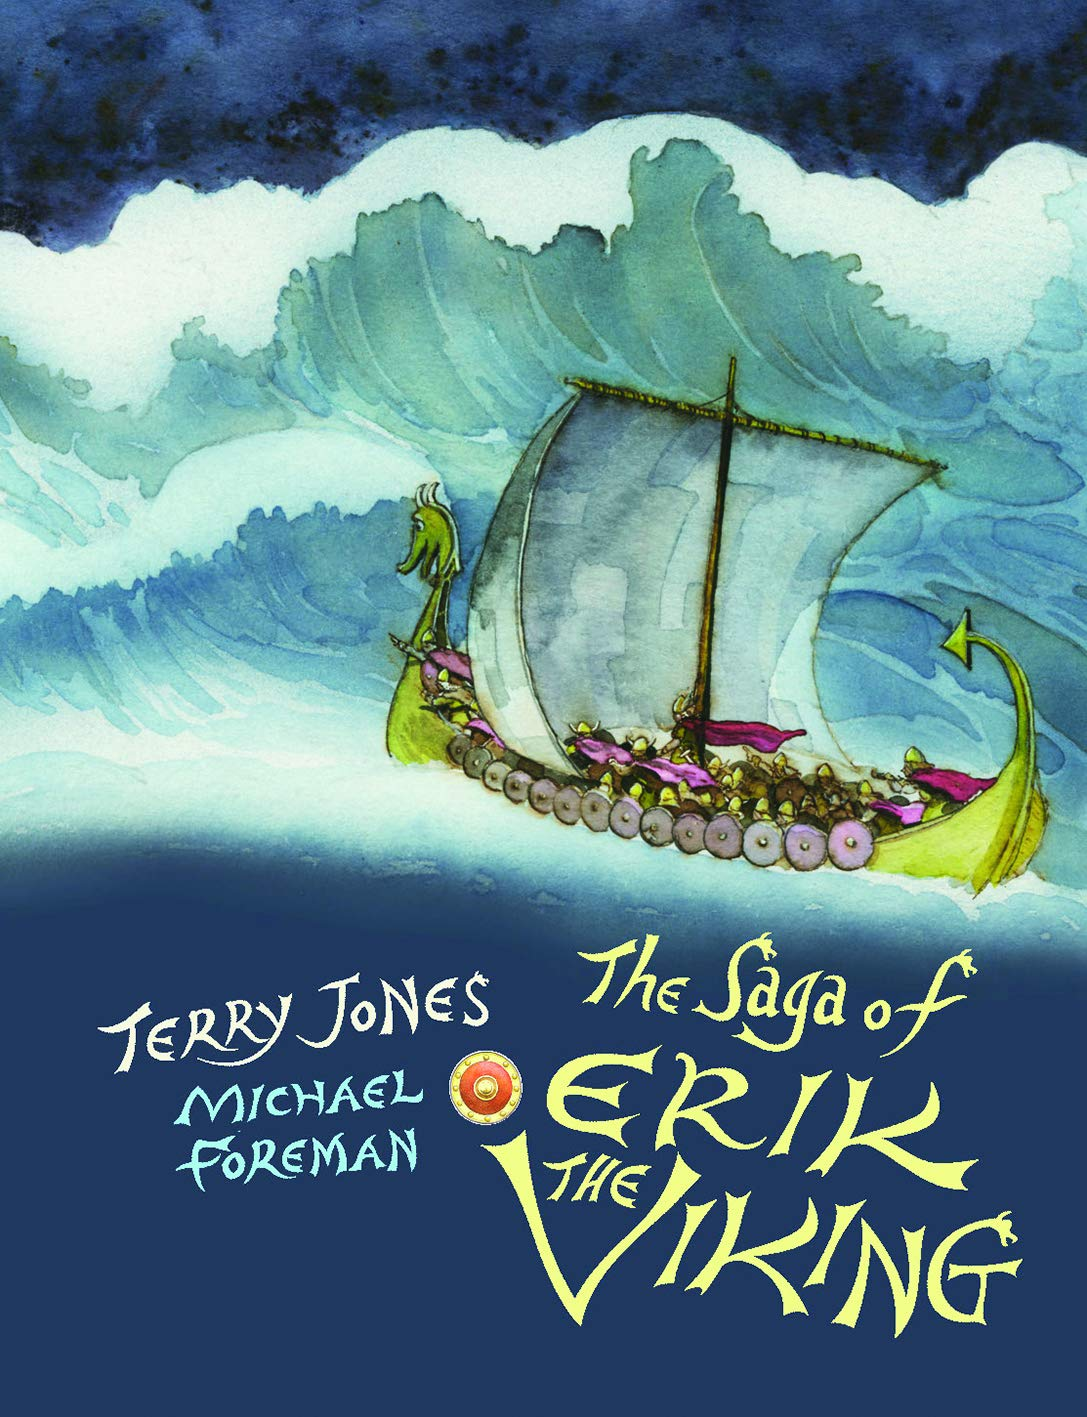 The Saga of Erik the Viking: Amazon.co.uk: Jones, Terry, Foreman, Michael:  9781843653141: Books